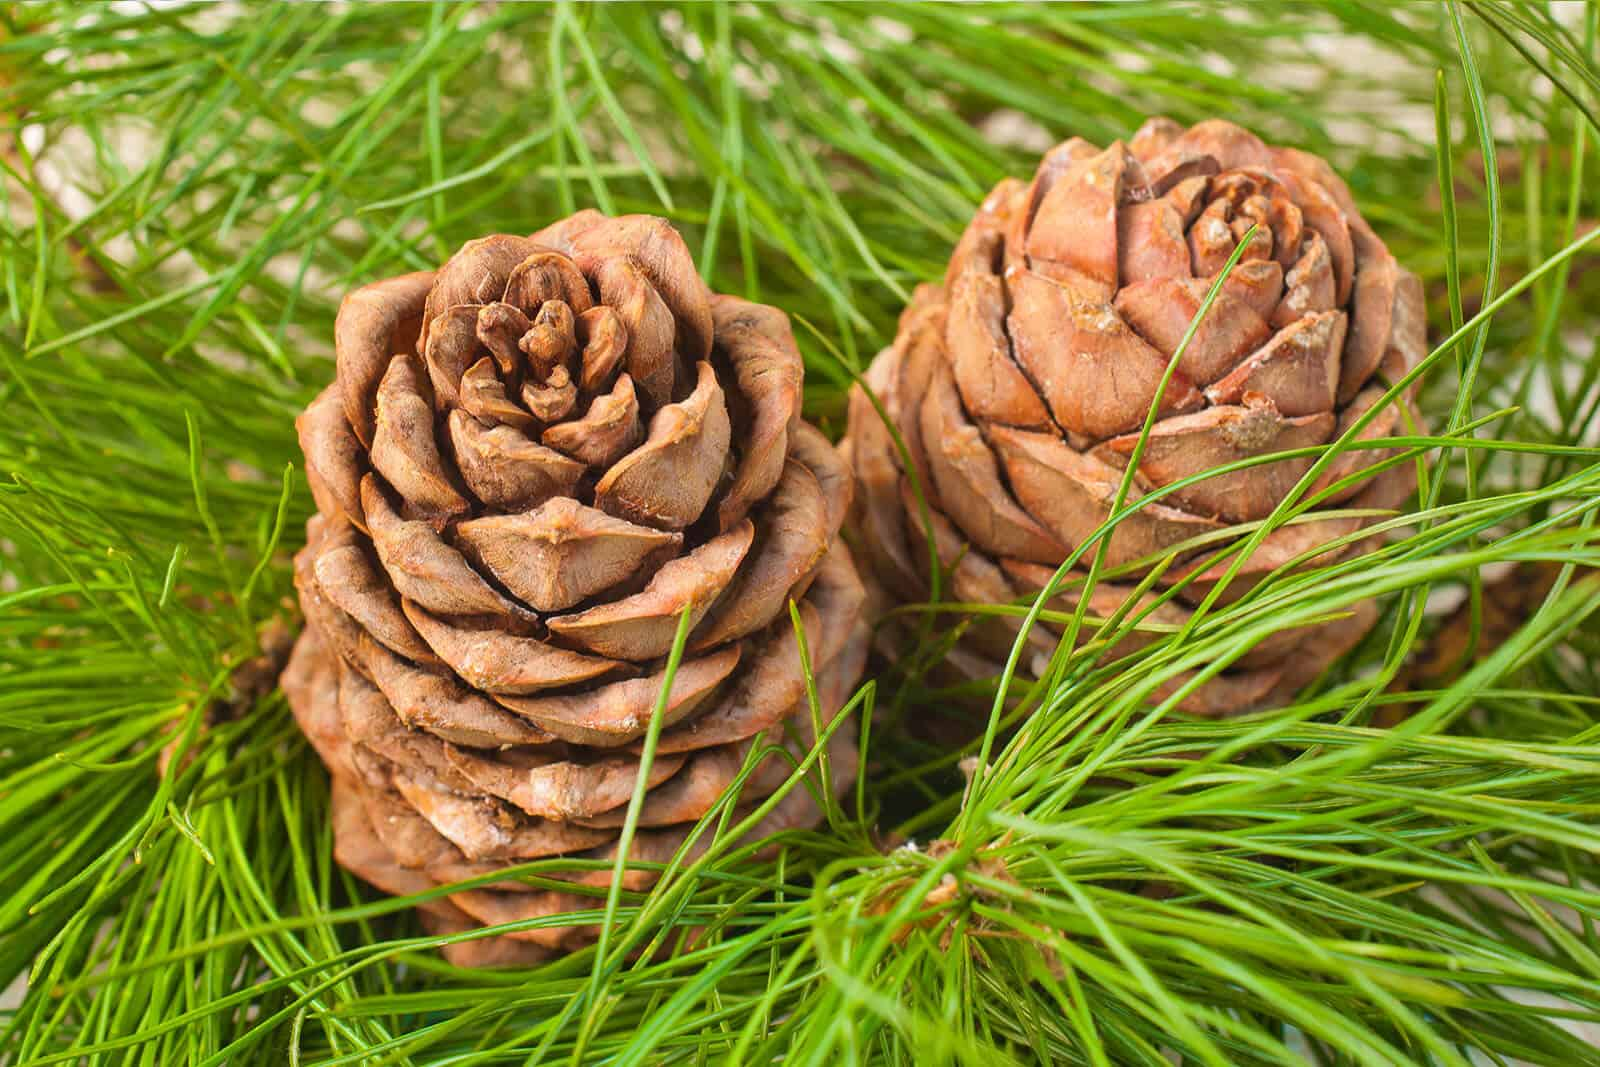 wellnessaromas-aromatherapy-essential-oil_cedarwood-benefits-uses